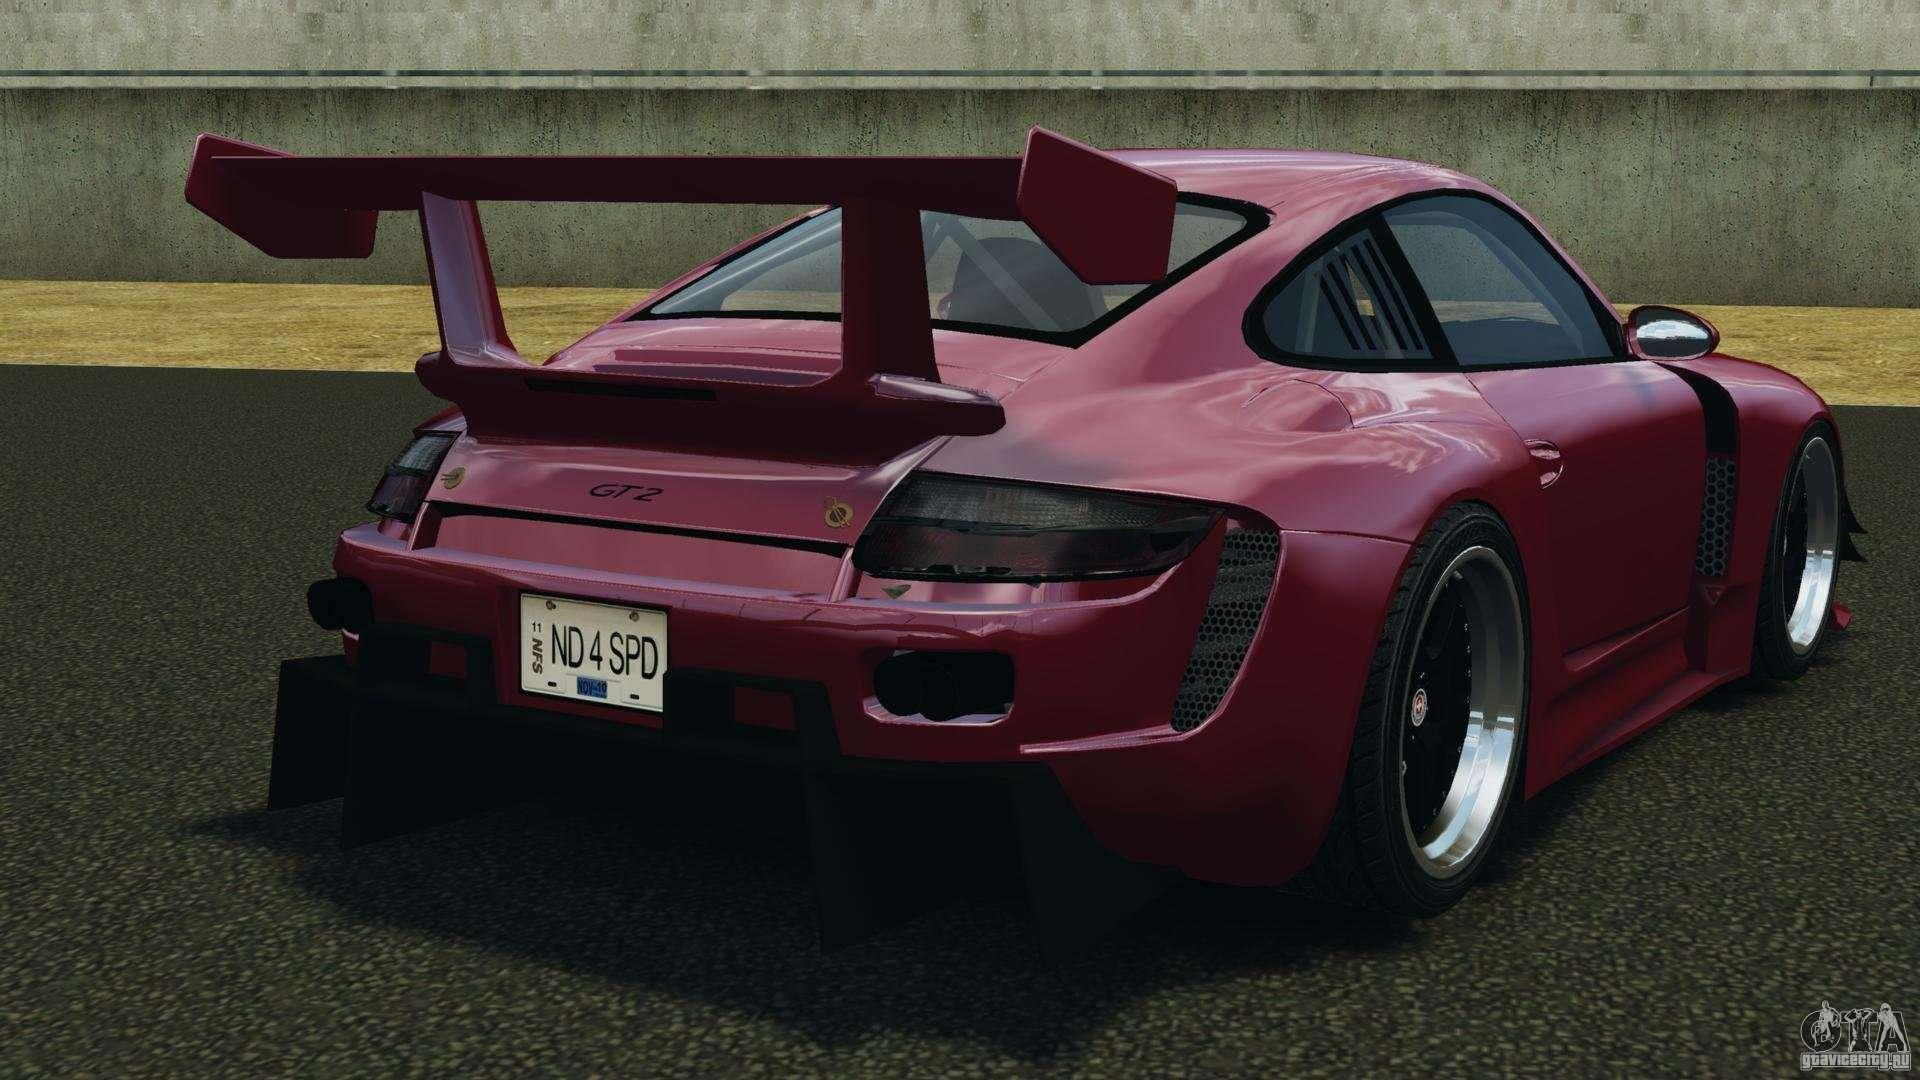 27565-1357254274-GTAIV2013-01-0402-34-39-63 Stunning Porsche 911 Gt2 Body Kit Cars Trend